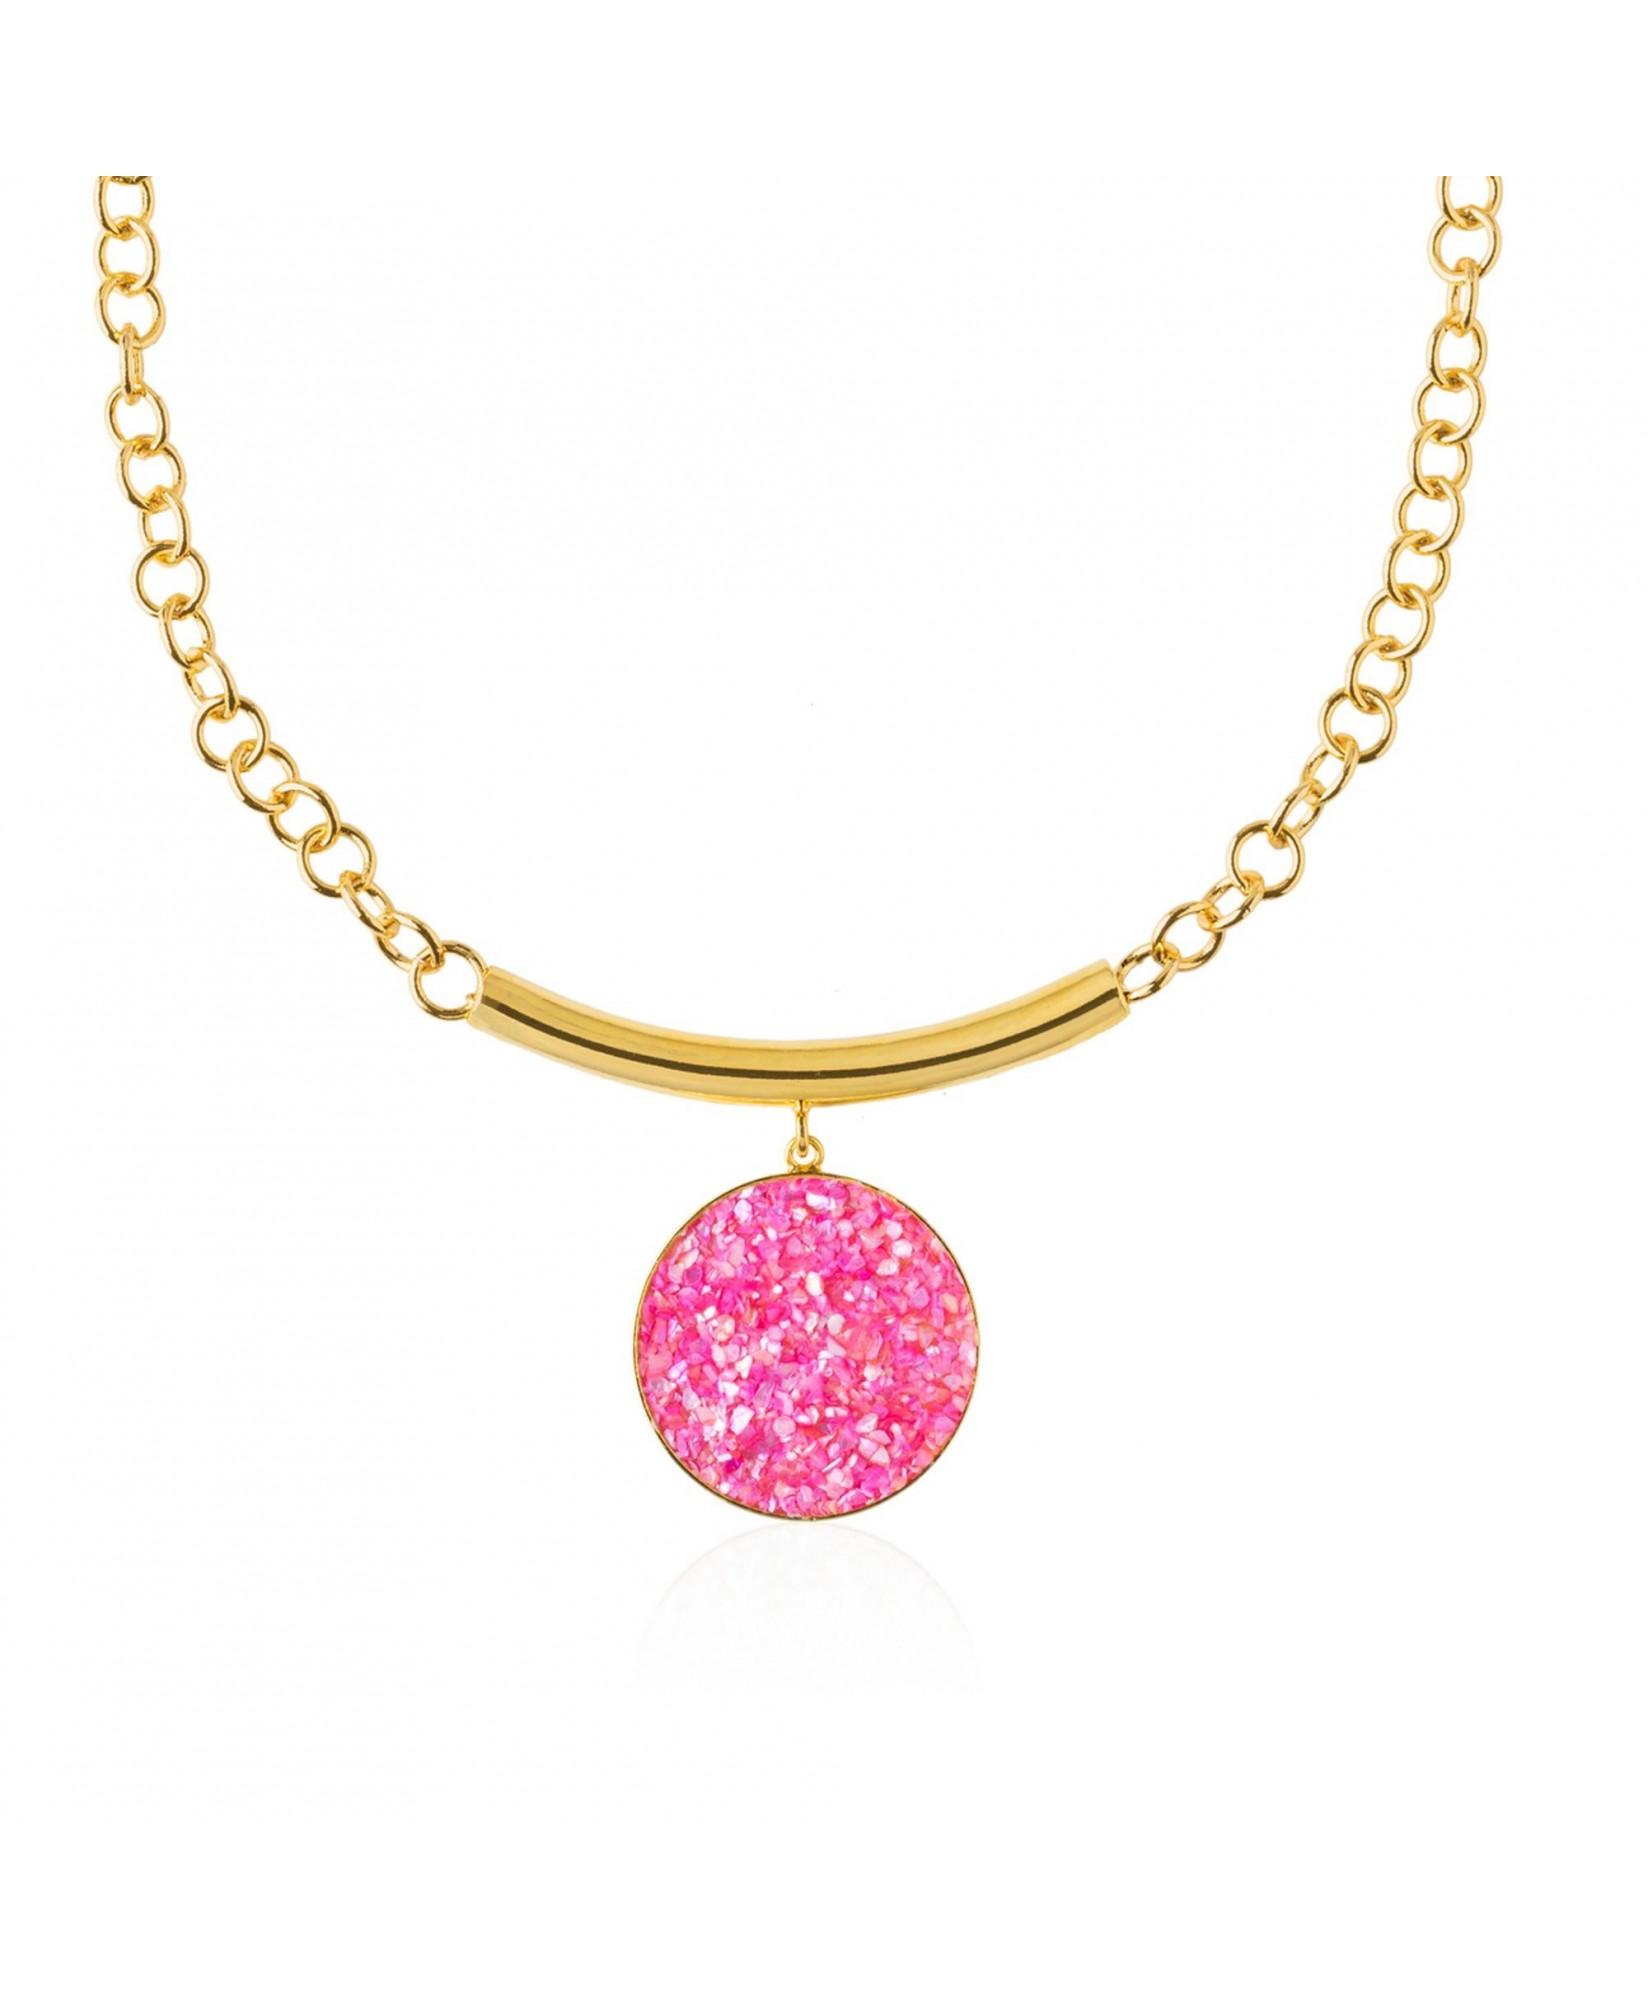 Collar oro con colgante Atenea con nácar rosa Collar oro con colgante Atenea con nácar rosa